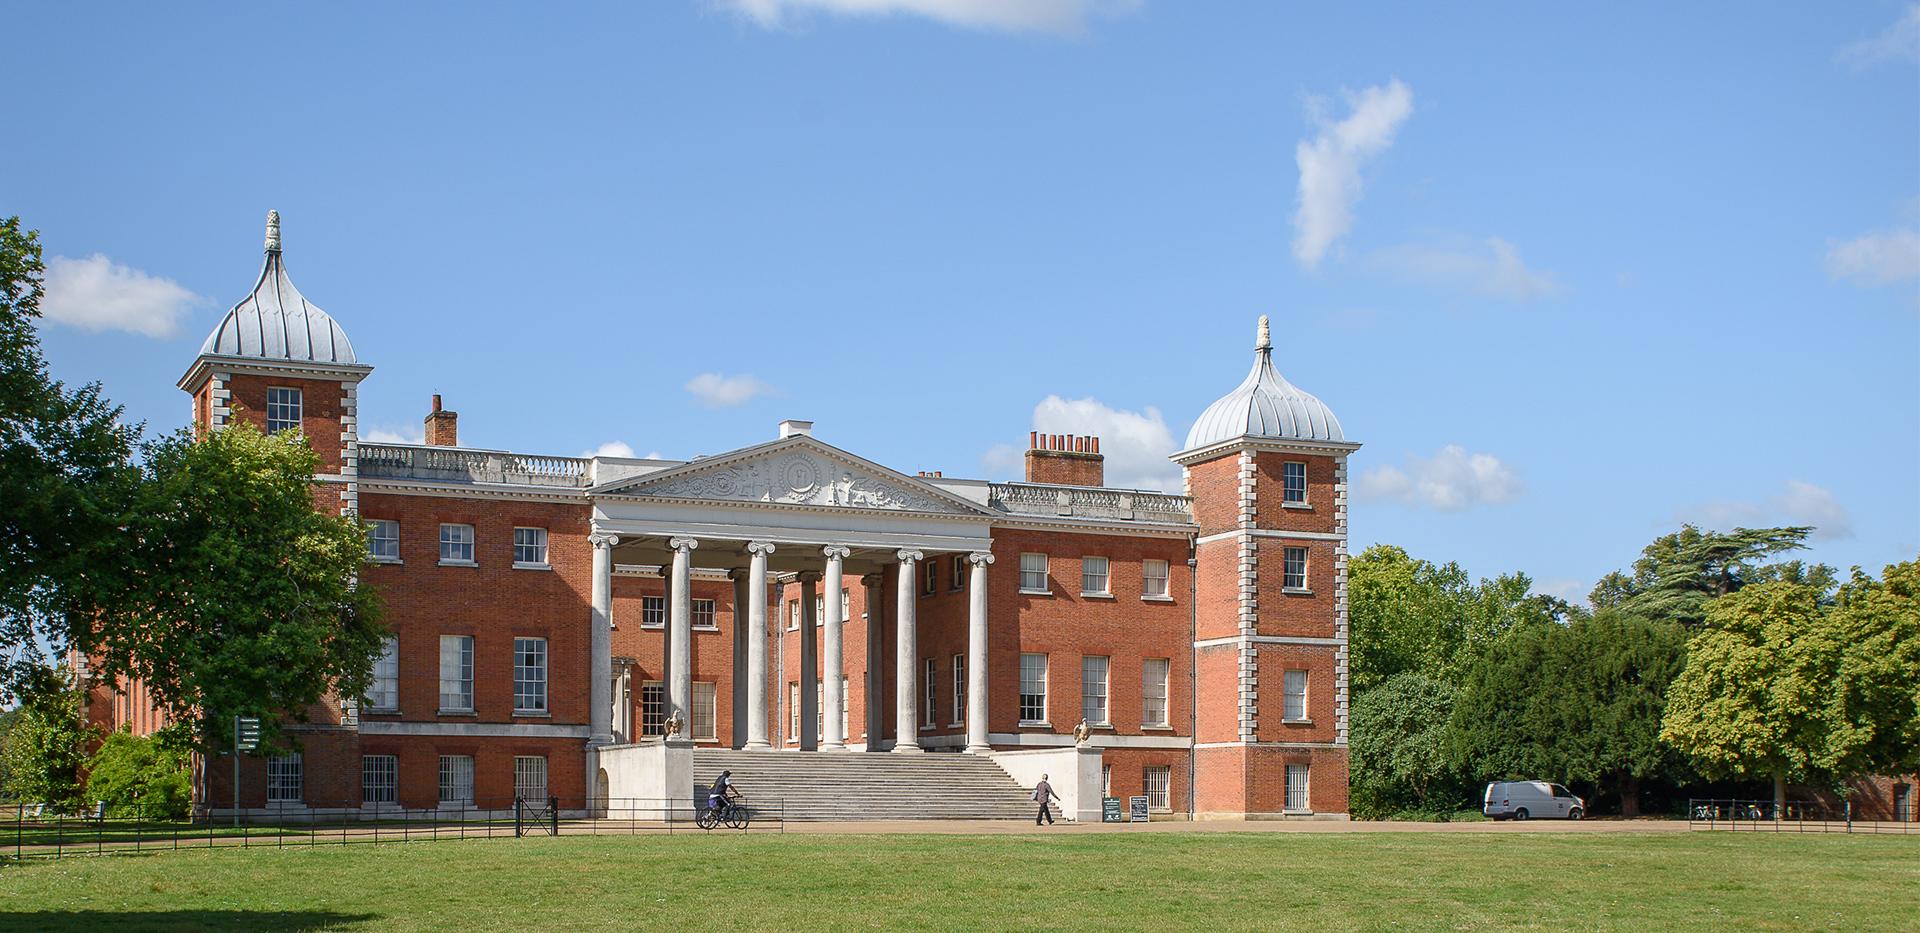 St James, Fitzroy Gate,Osterley Park